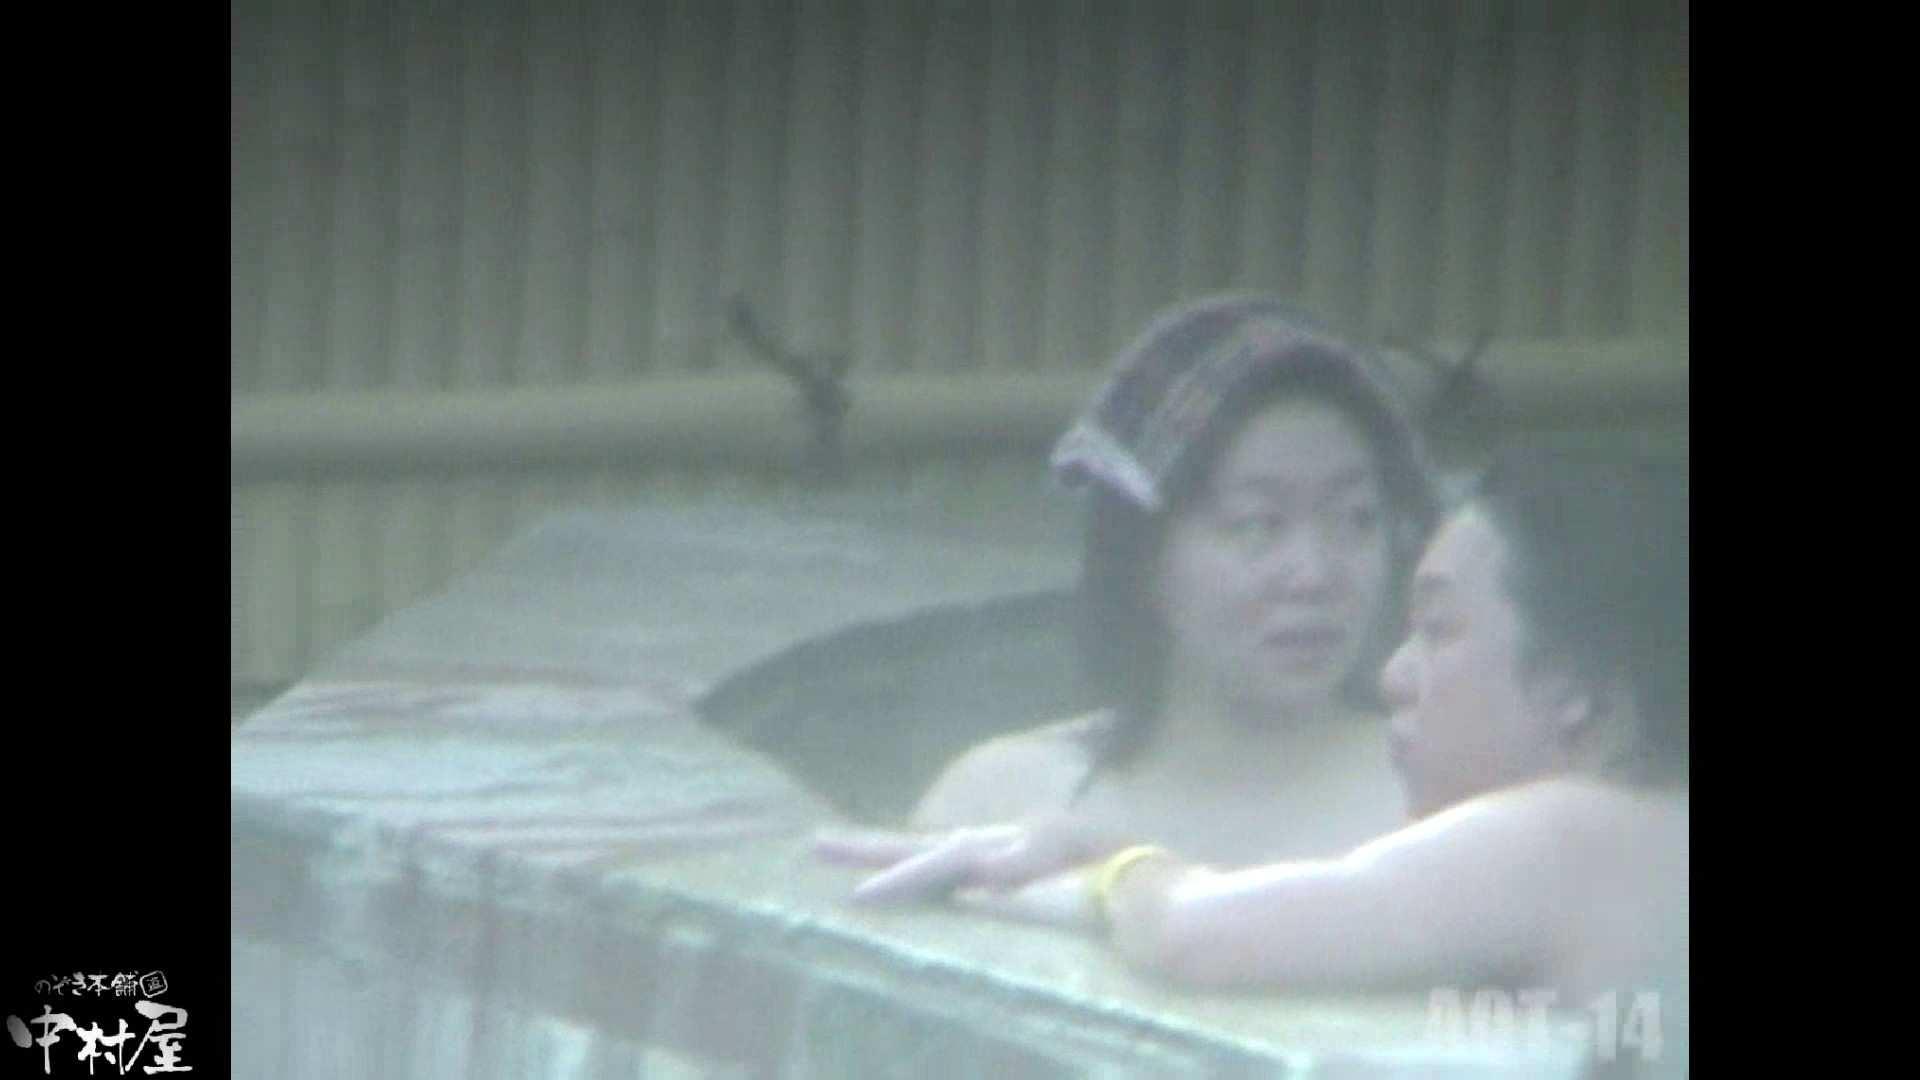 Aquaな露天風呂Vol.878潜入盗撮露天風呂十四判湯 其の十一 潜入 おまんこ動画流出 91PIX 80